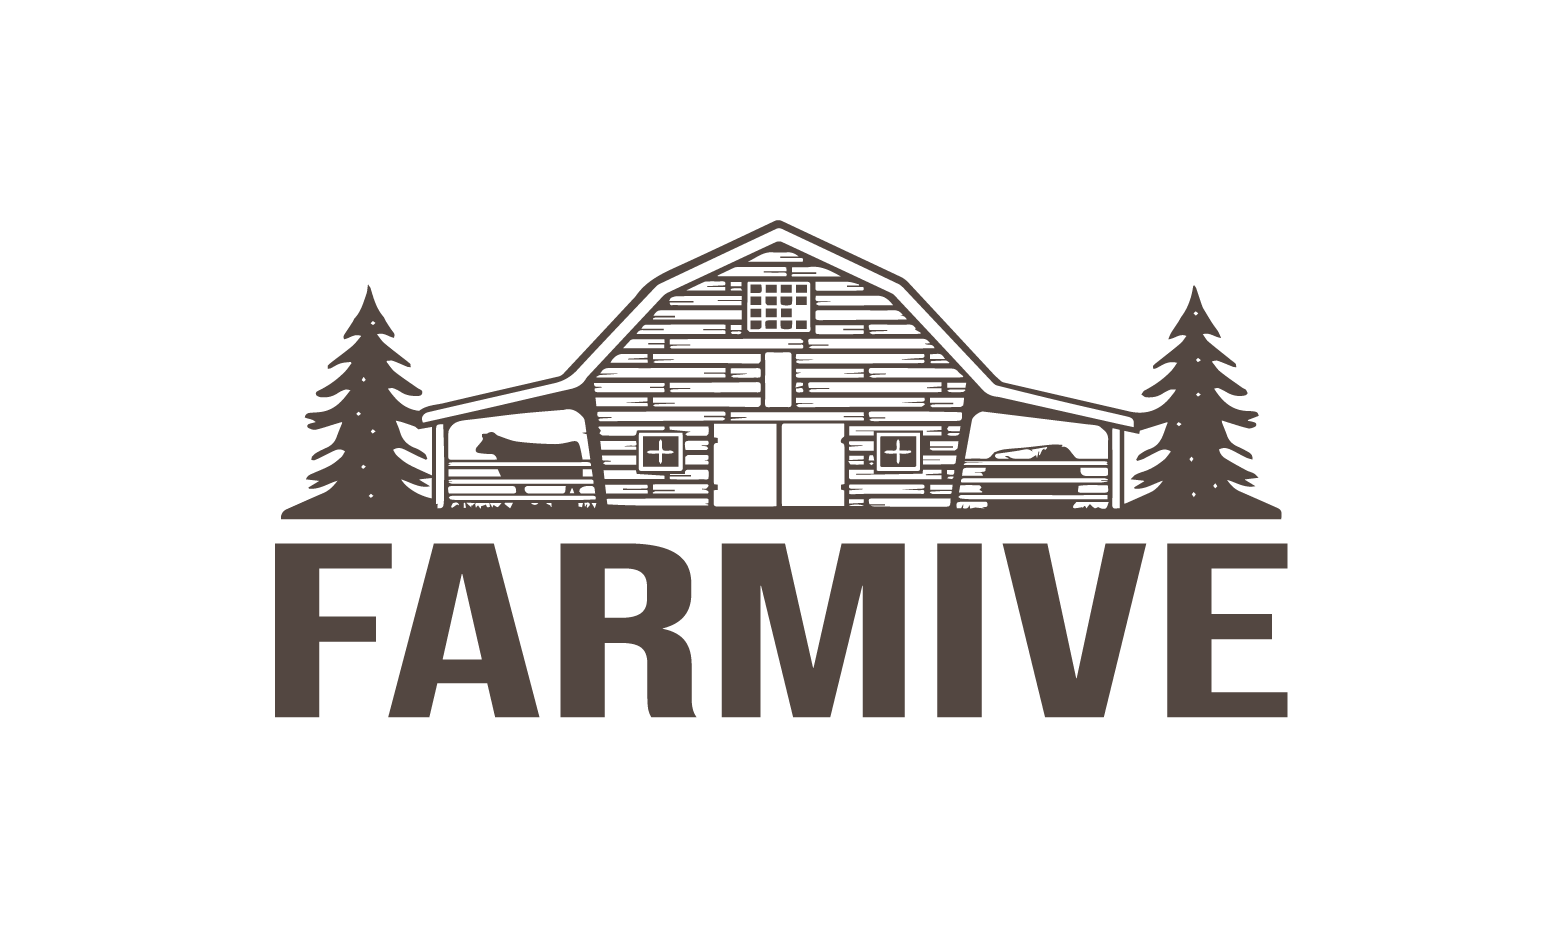 Farmive.com